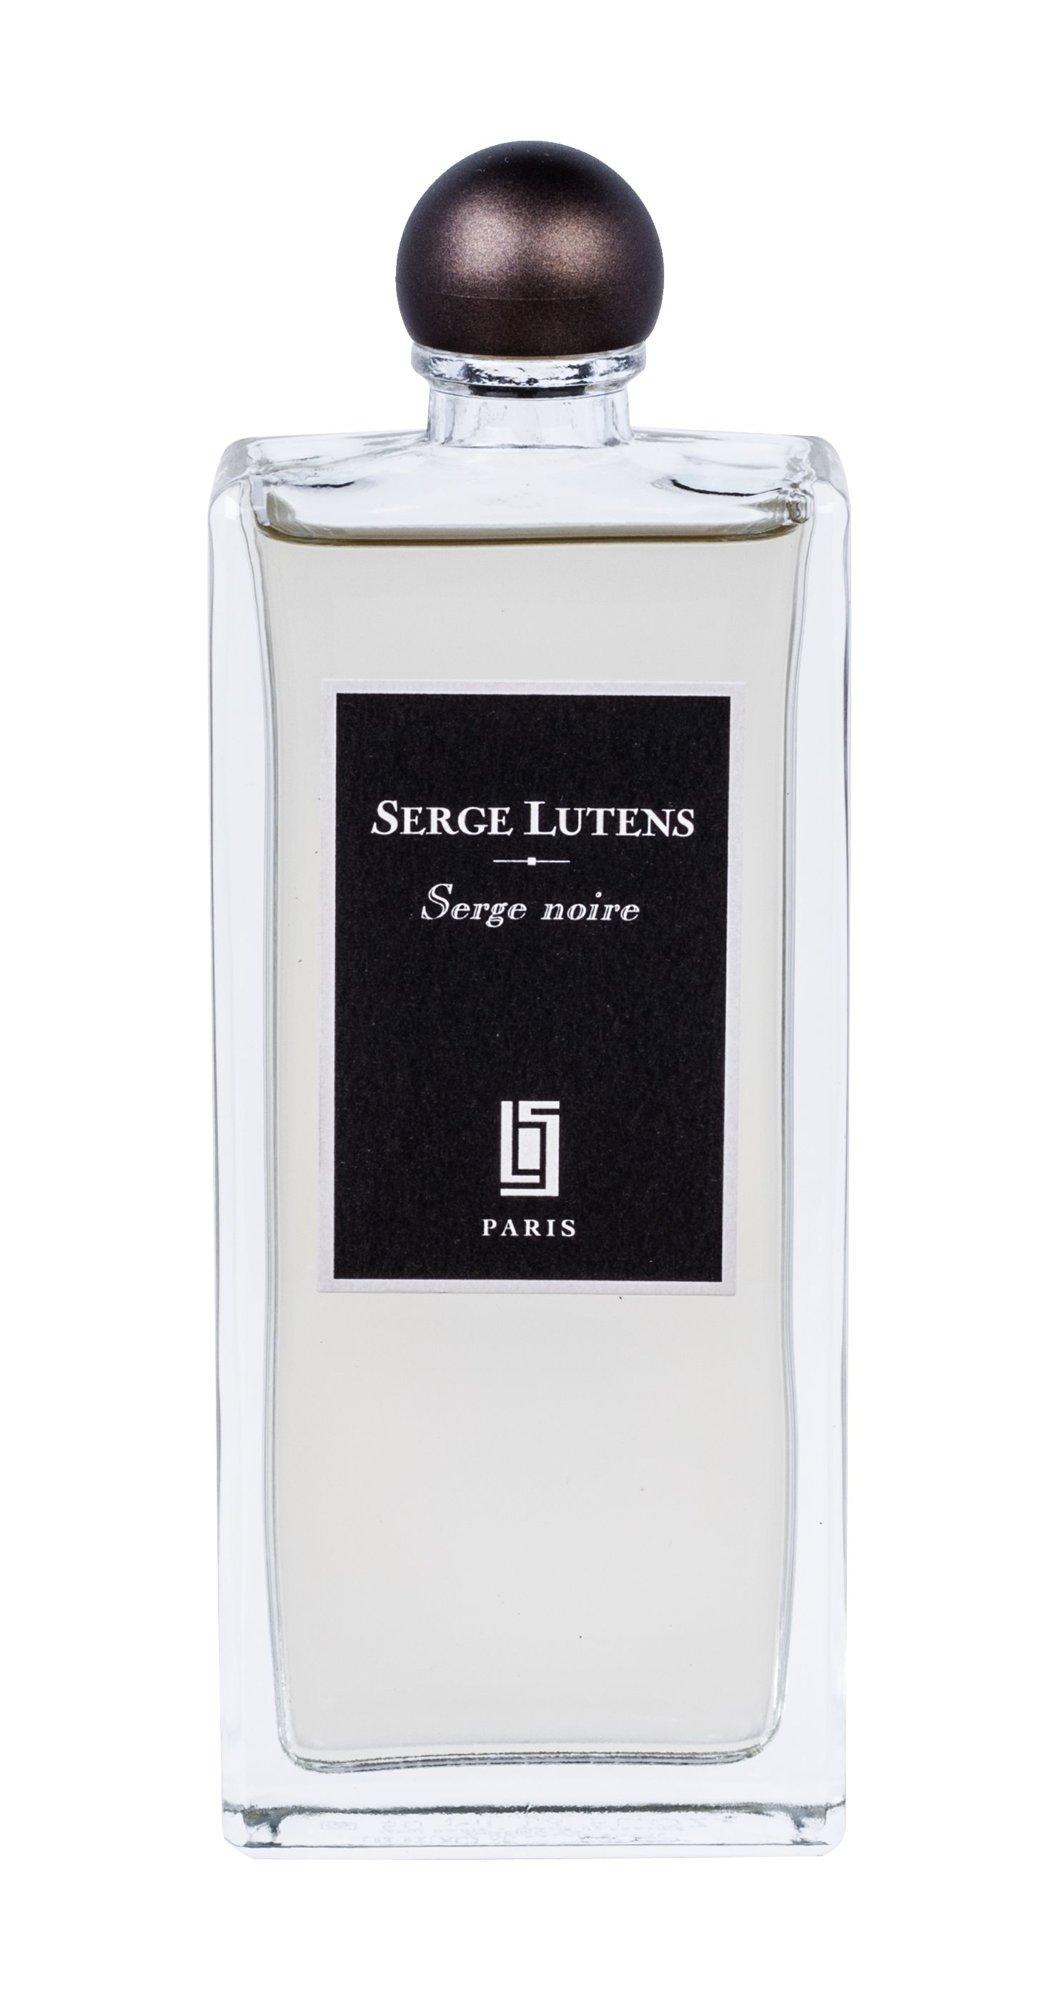 Serge Lutens Serge Noire EDP 50ml